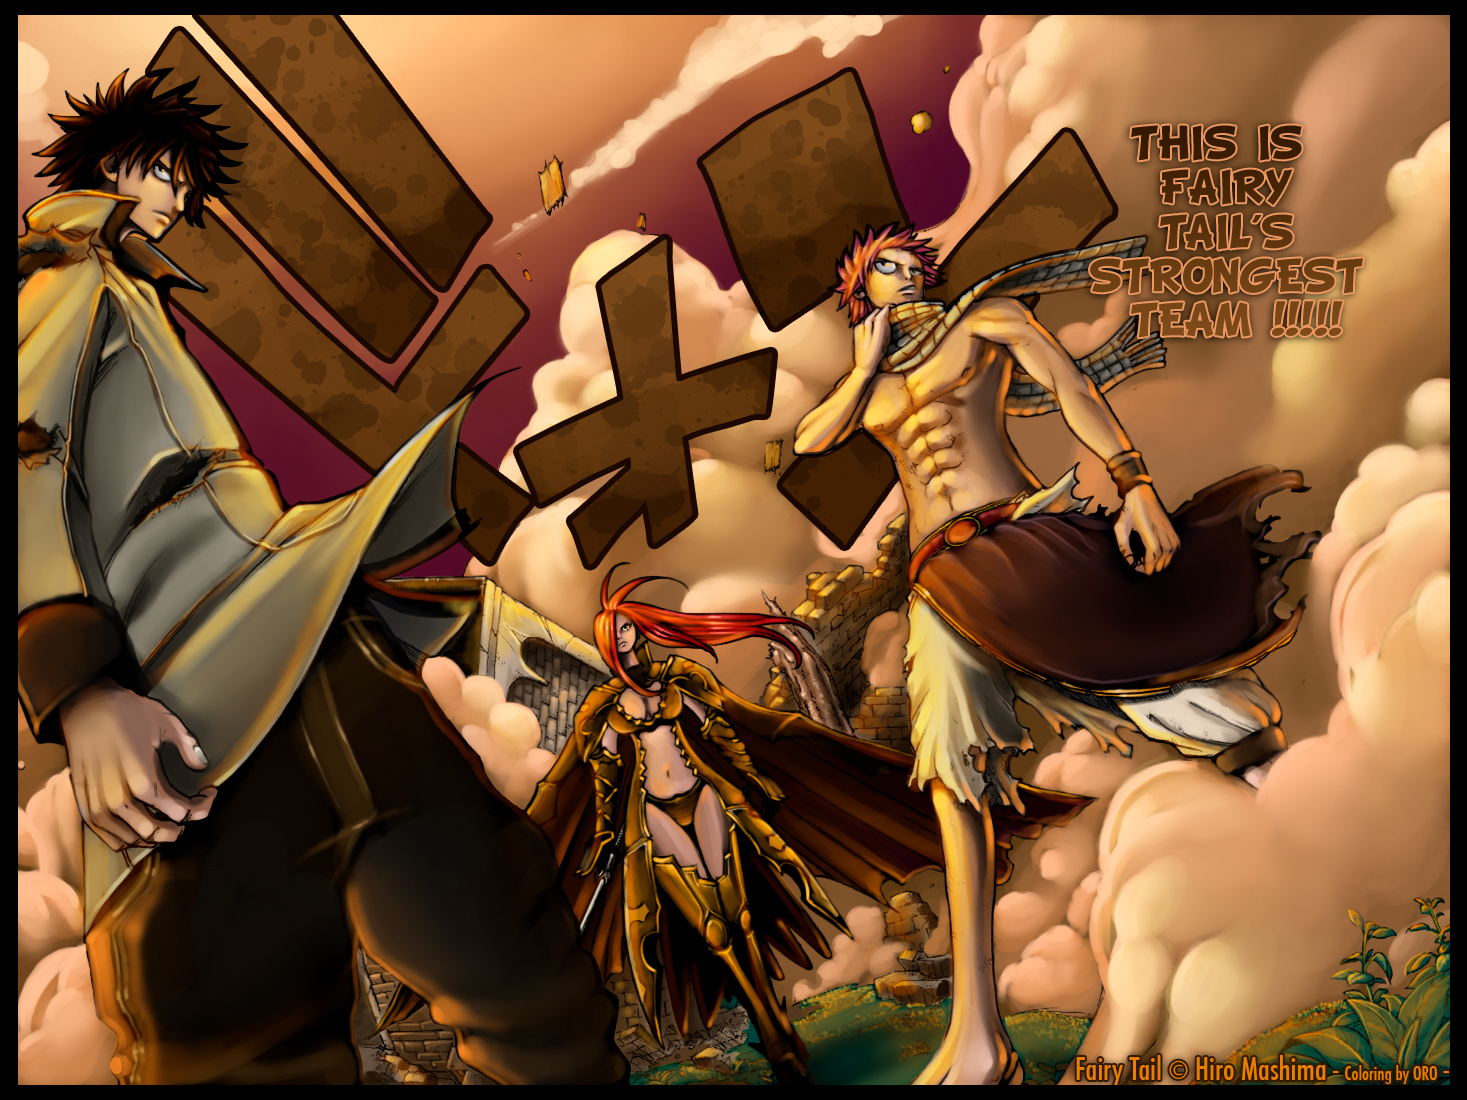 http://3.bp.blogspot.com/-BHK9dkpf3K0/TiL-Jas4c1I/AAAAAAAABlg/NpW6xQembWg/s1600/Fairy_tail_the_strongest_team_by_Gandaresh.jpg